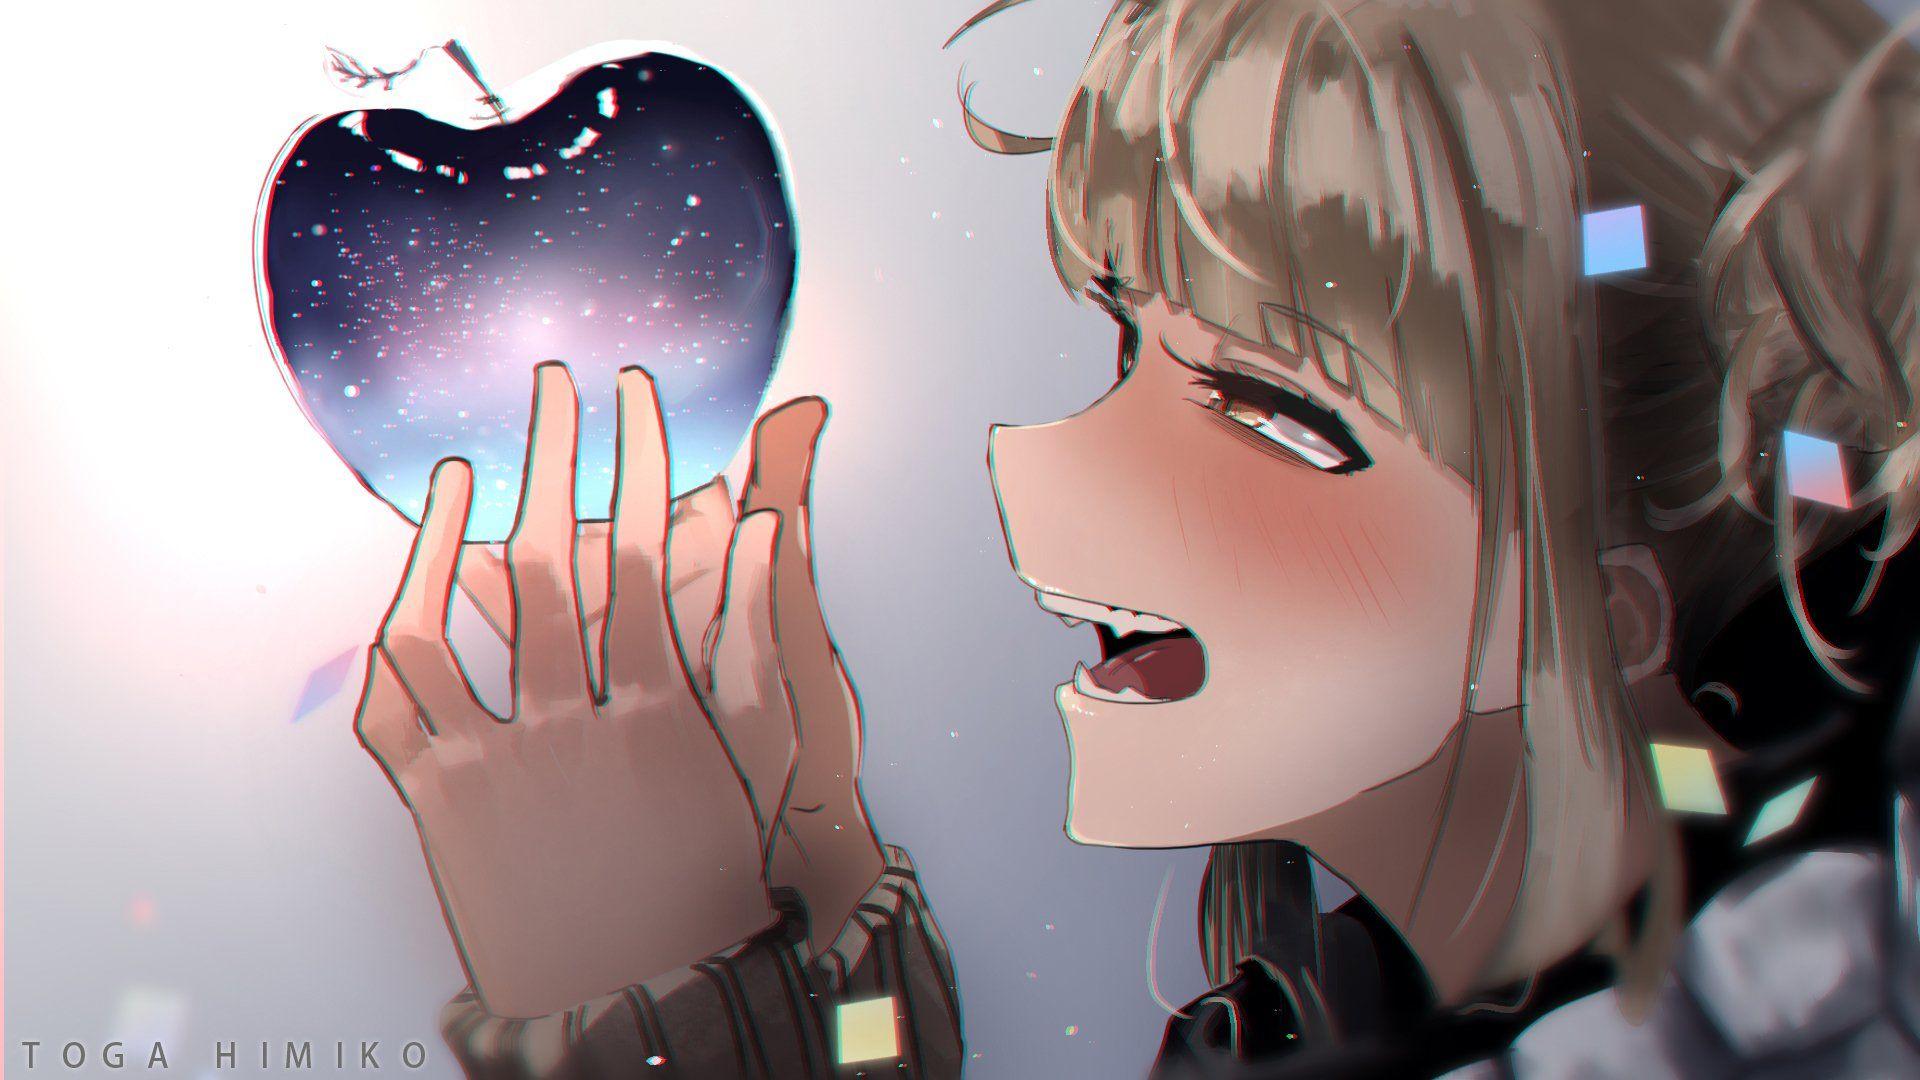 Pin de Tomioka em Himiko toga em 2020 Menina anime